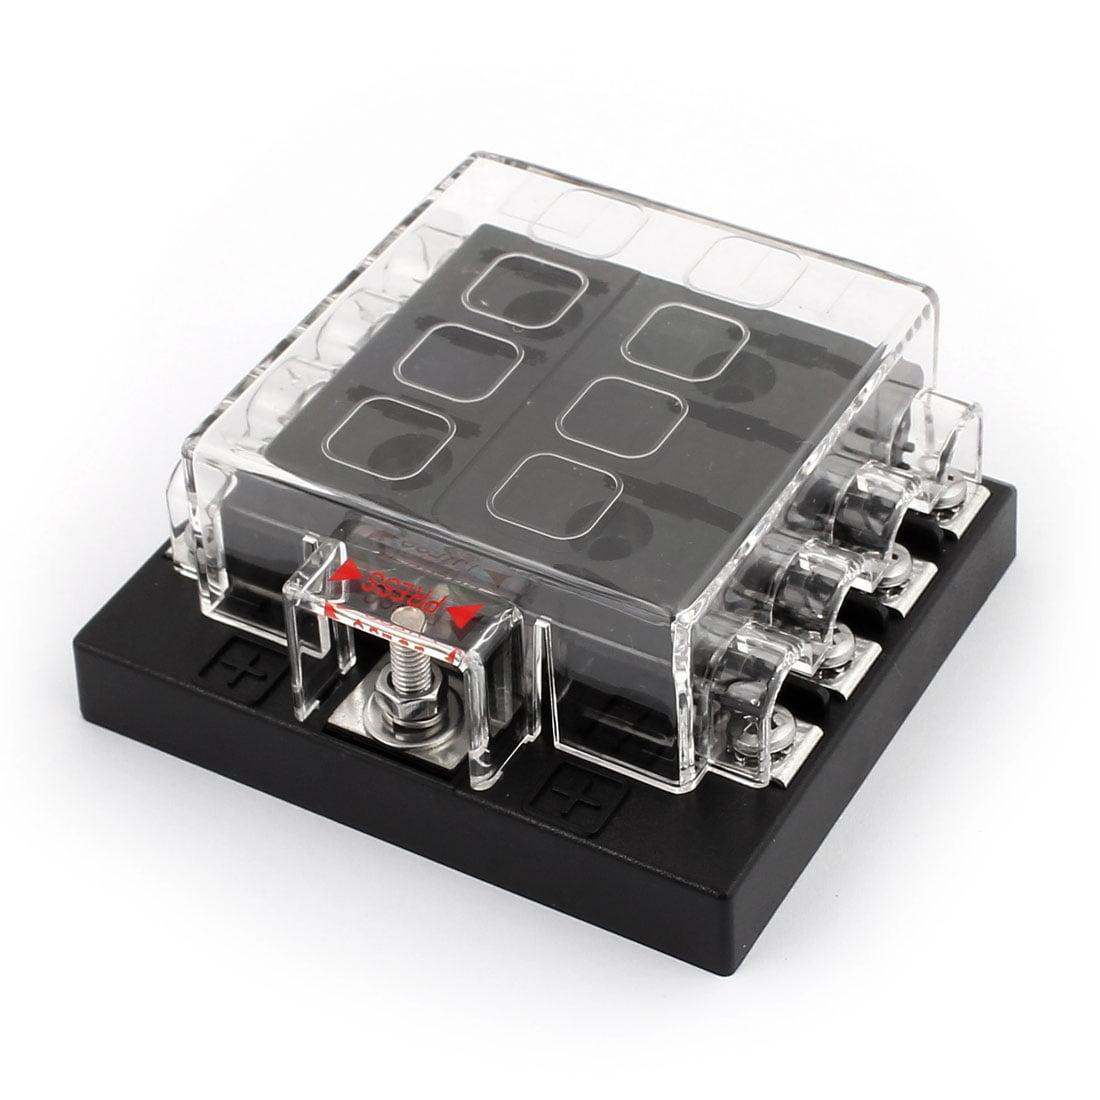 dc32v 8 way terminals circuit car auto blade fuse box block holder w rh walmart ca Murano Fuse Box Circuit 2012 Kia Soul Fuse Box